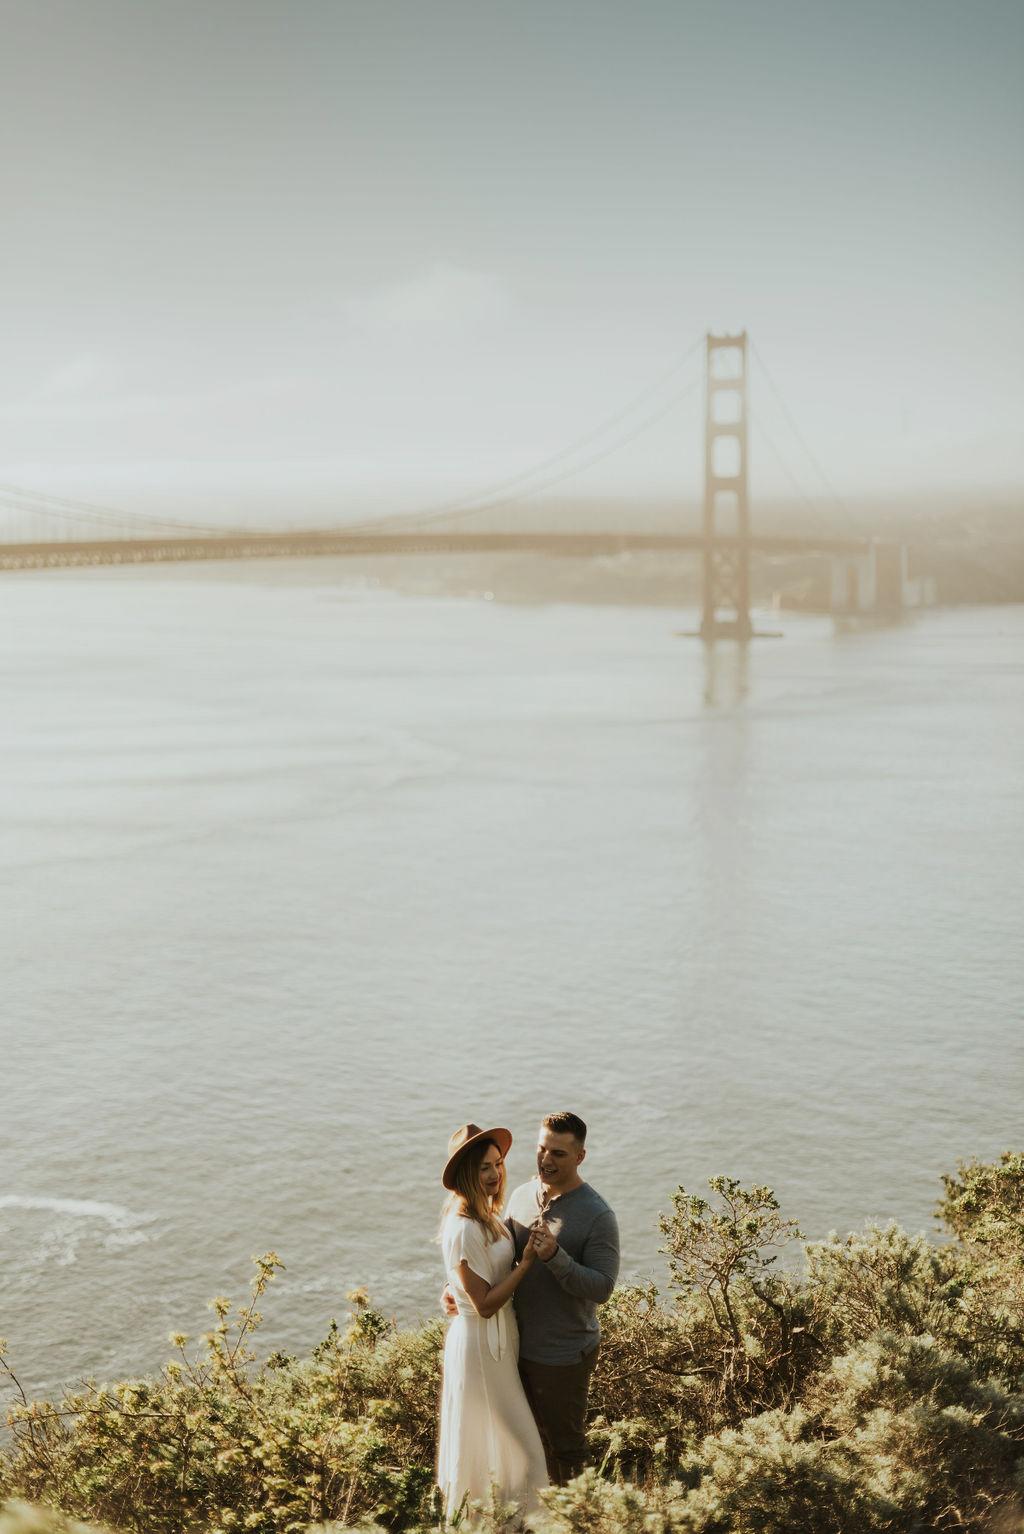 San Francisco Couple Session at Marin Headlands & The Golden Gate Bridge 49.jpg